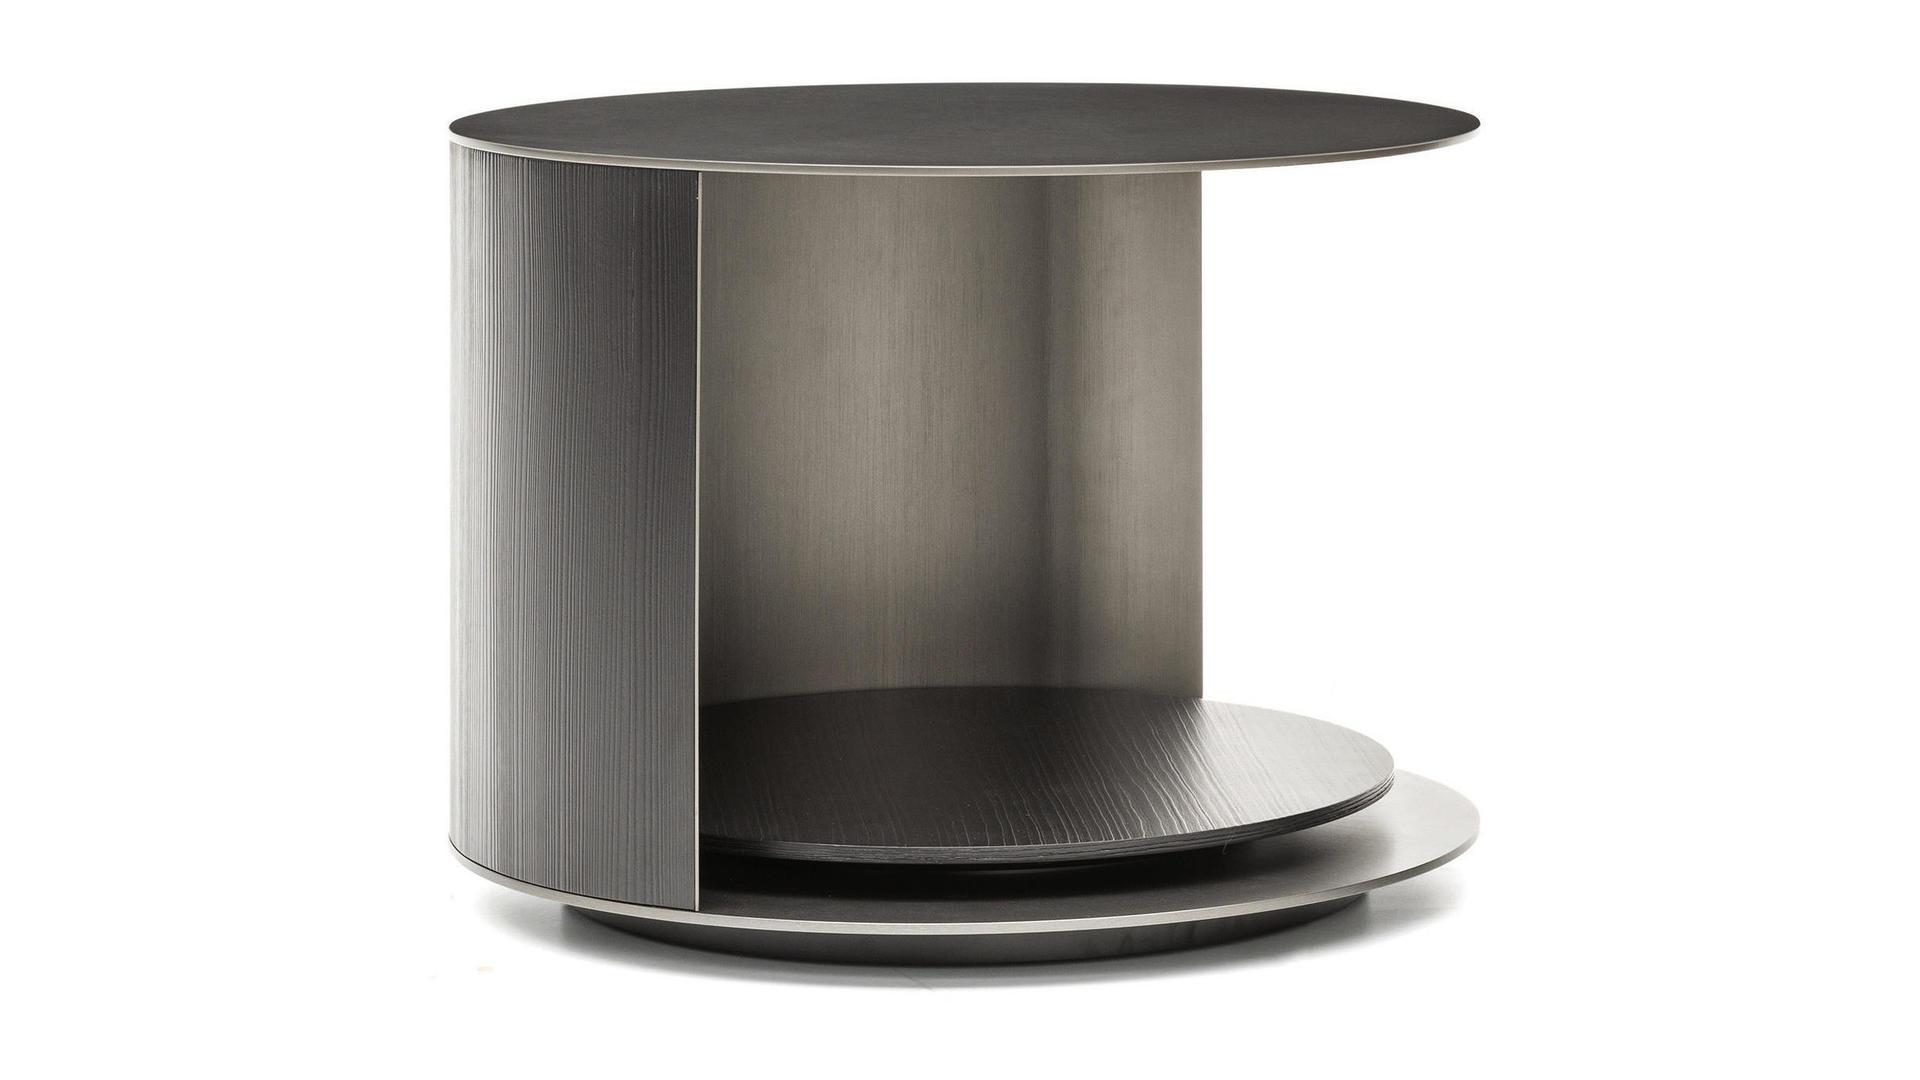 Richer coffee table low.jpg